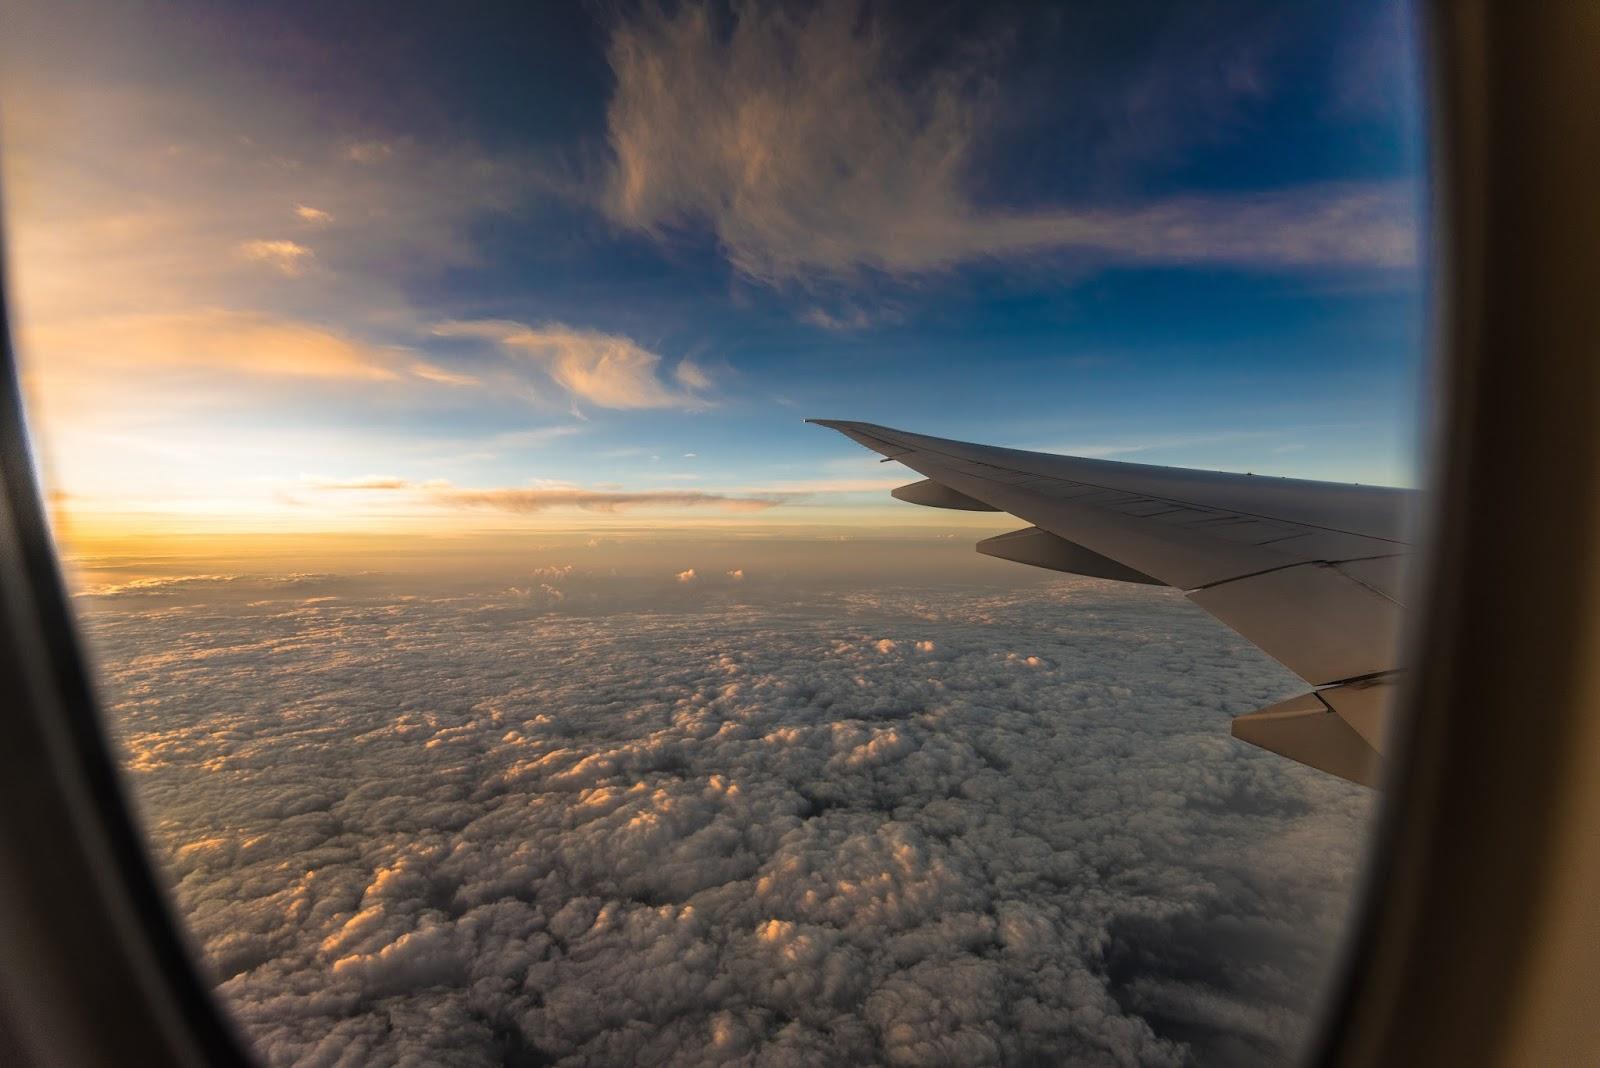 Sunset Airplane Window View Wallpaper